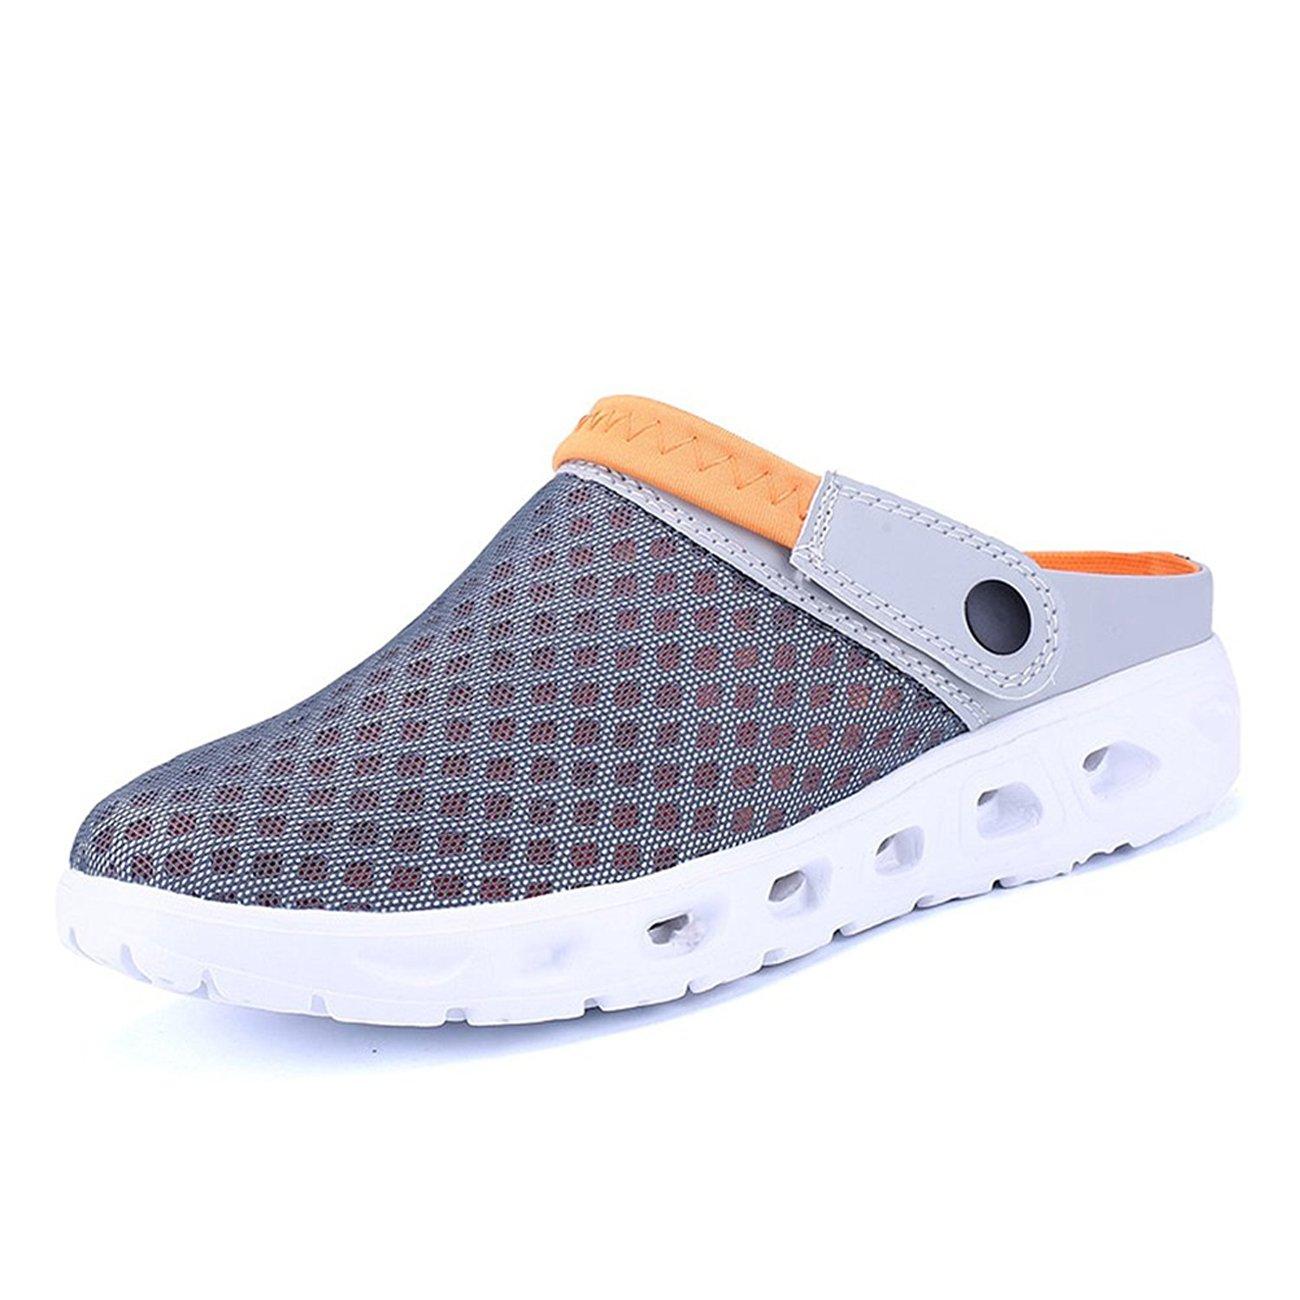 CCZZ Men's and Women's Summer Breathable Mesh Beach Sandals Slippers Quick Drying Water Shoes Amphibious Slip On Garden Shoes B07BWBJ6Z2 US 6.5=EU 39|Gray Orange